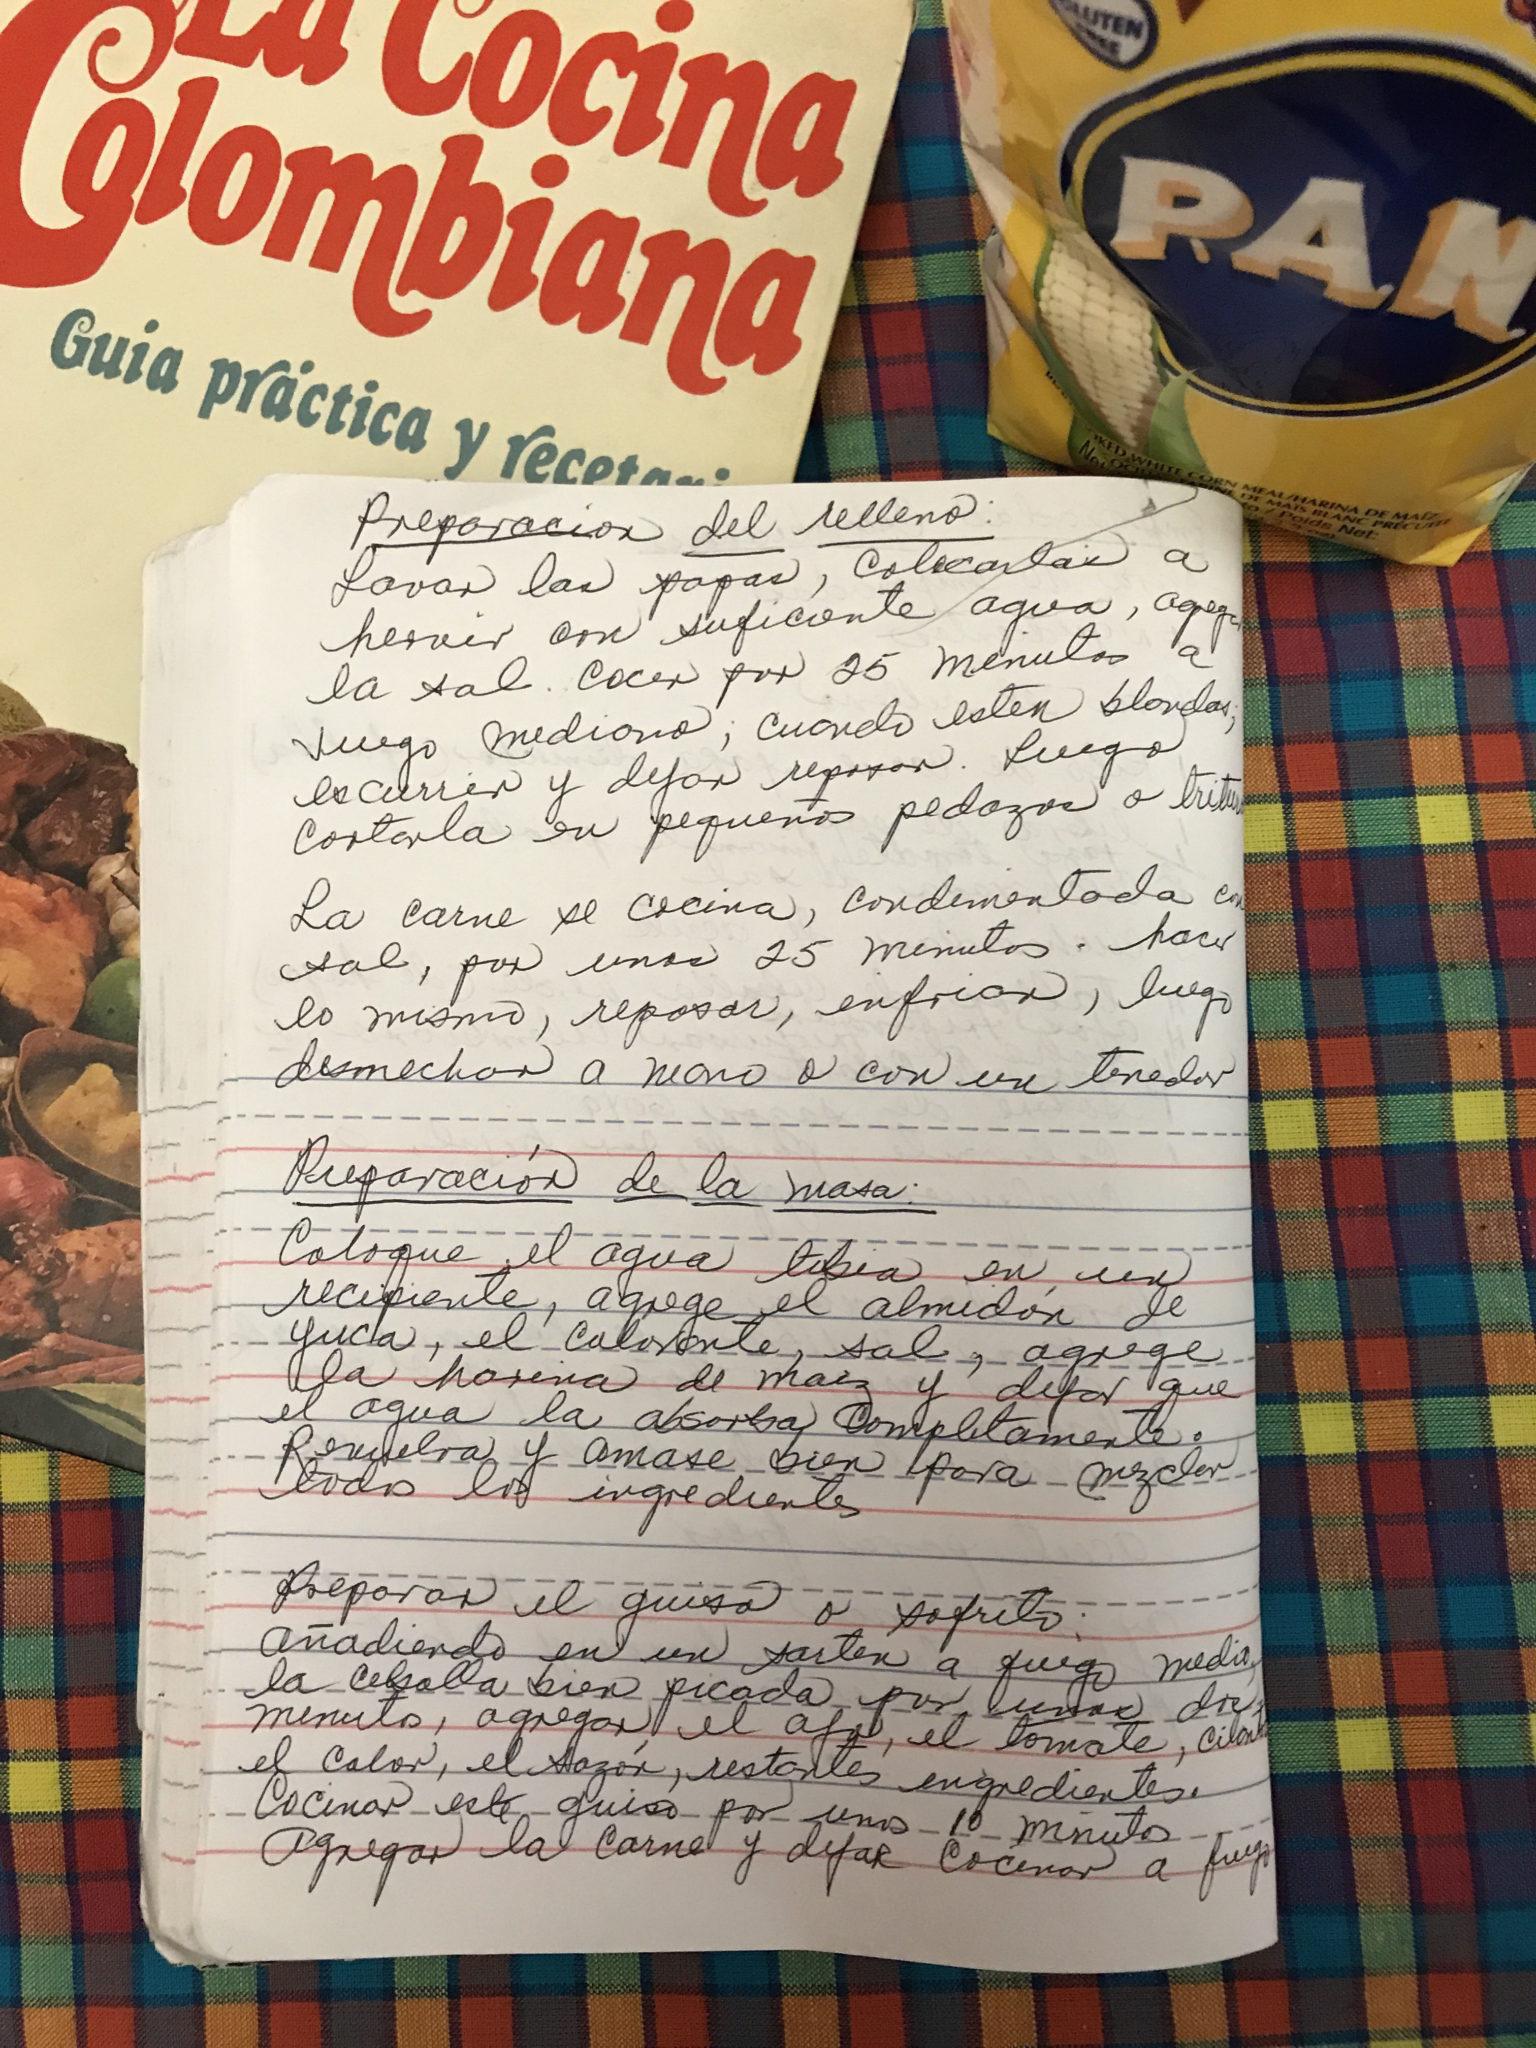 empanadas-recipe-2-1.jpg